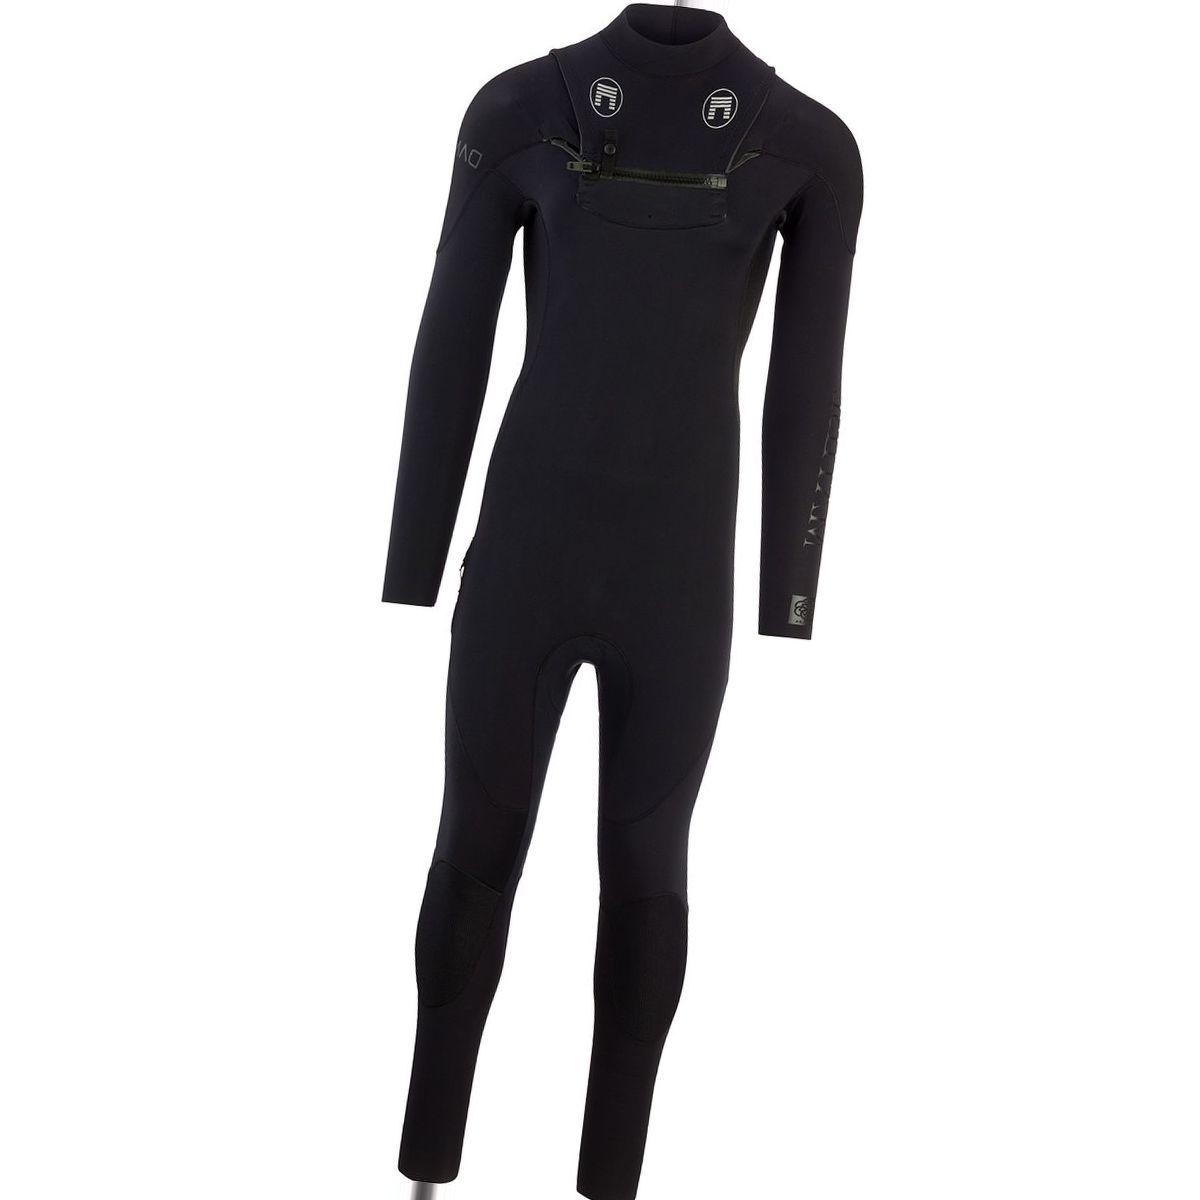 Matuse Dante 3/2mm Front Zip Full Wetsuit - Men's